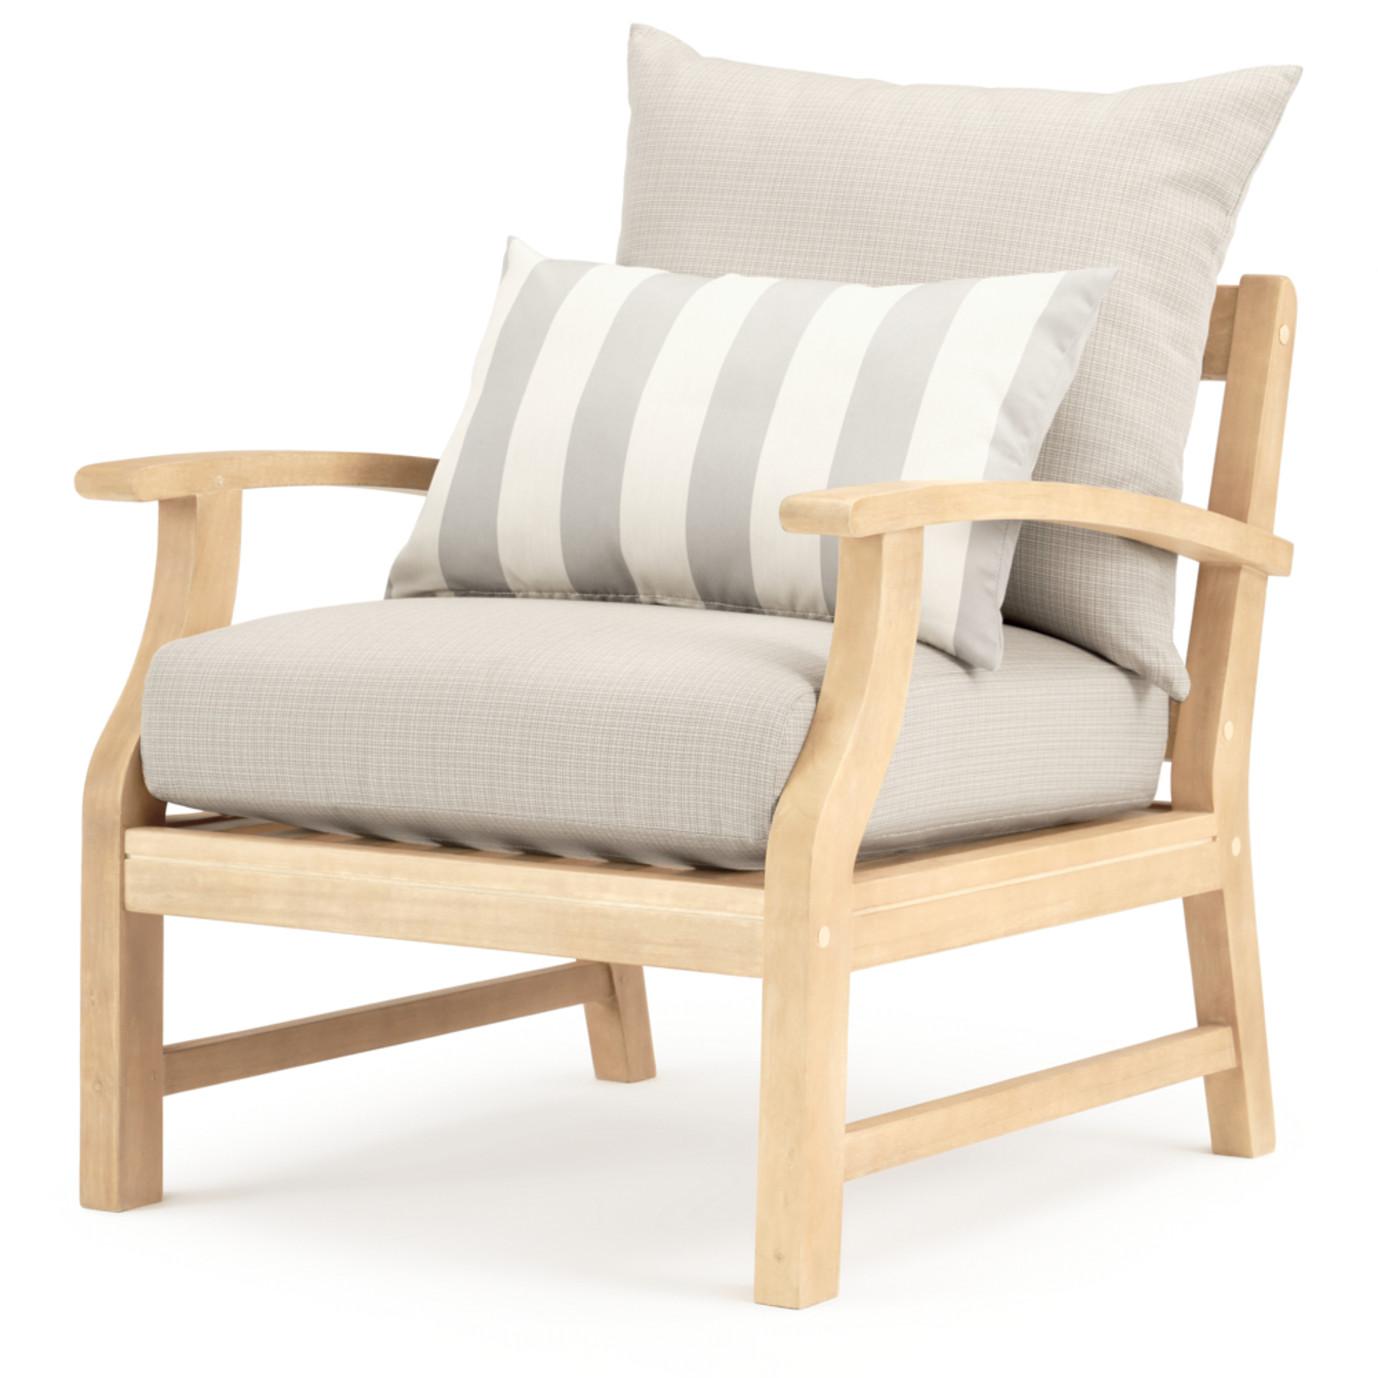 Kooper™ 7pc Outdoor Sofa & Club Chair Set - Slate Gray